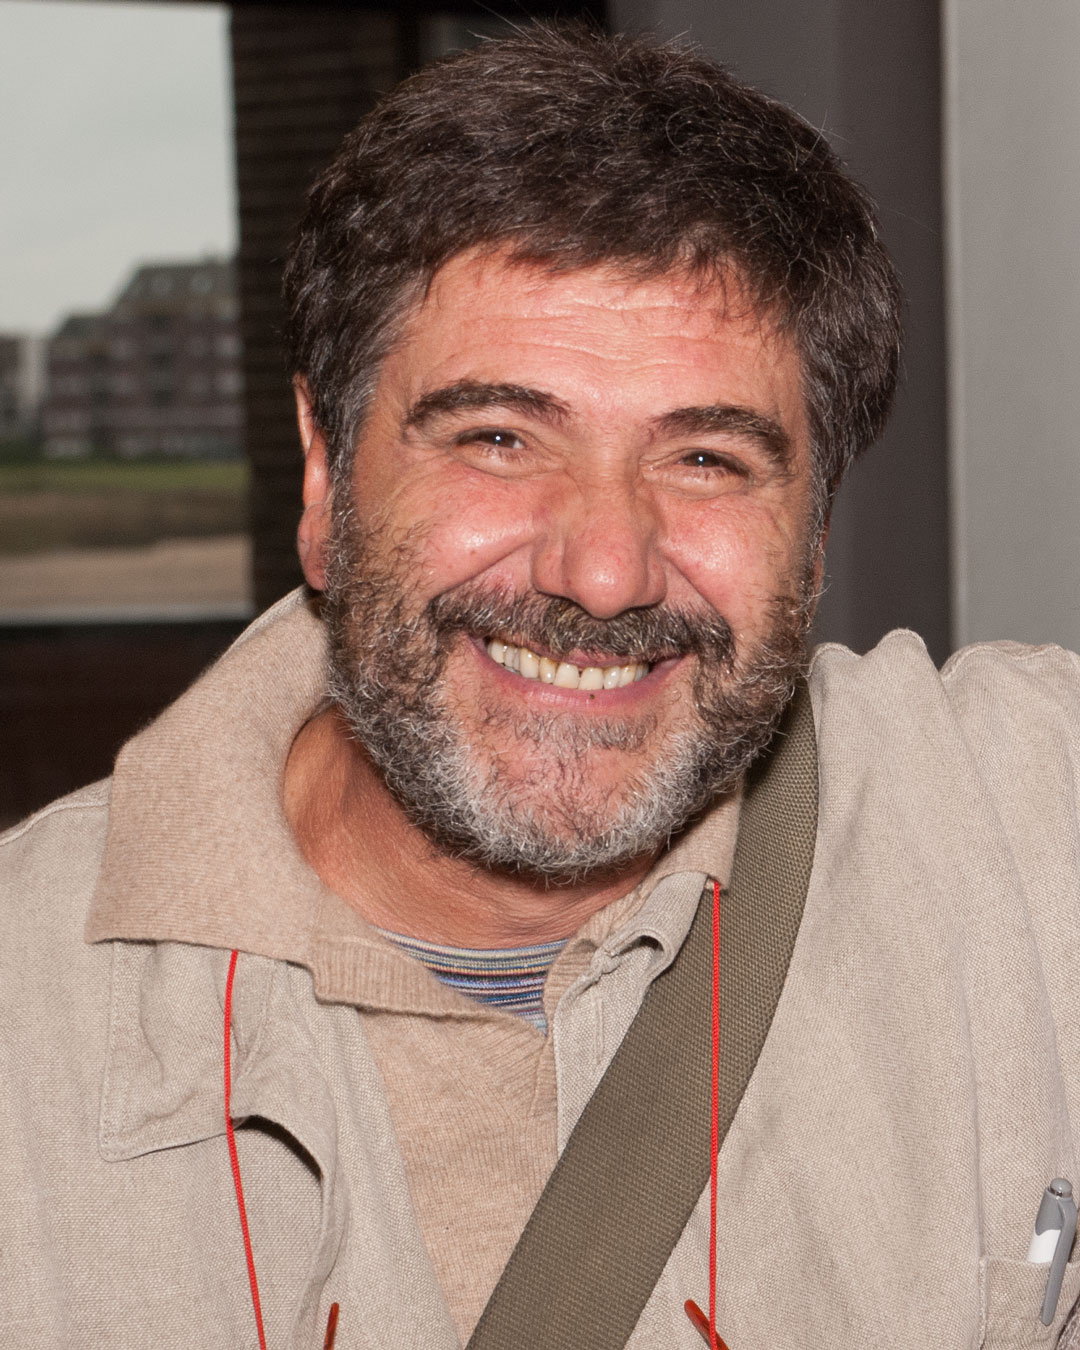 Graziano Visintin, 2009